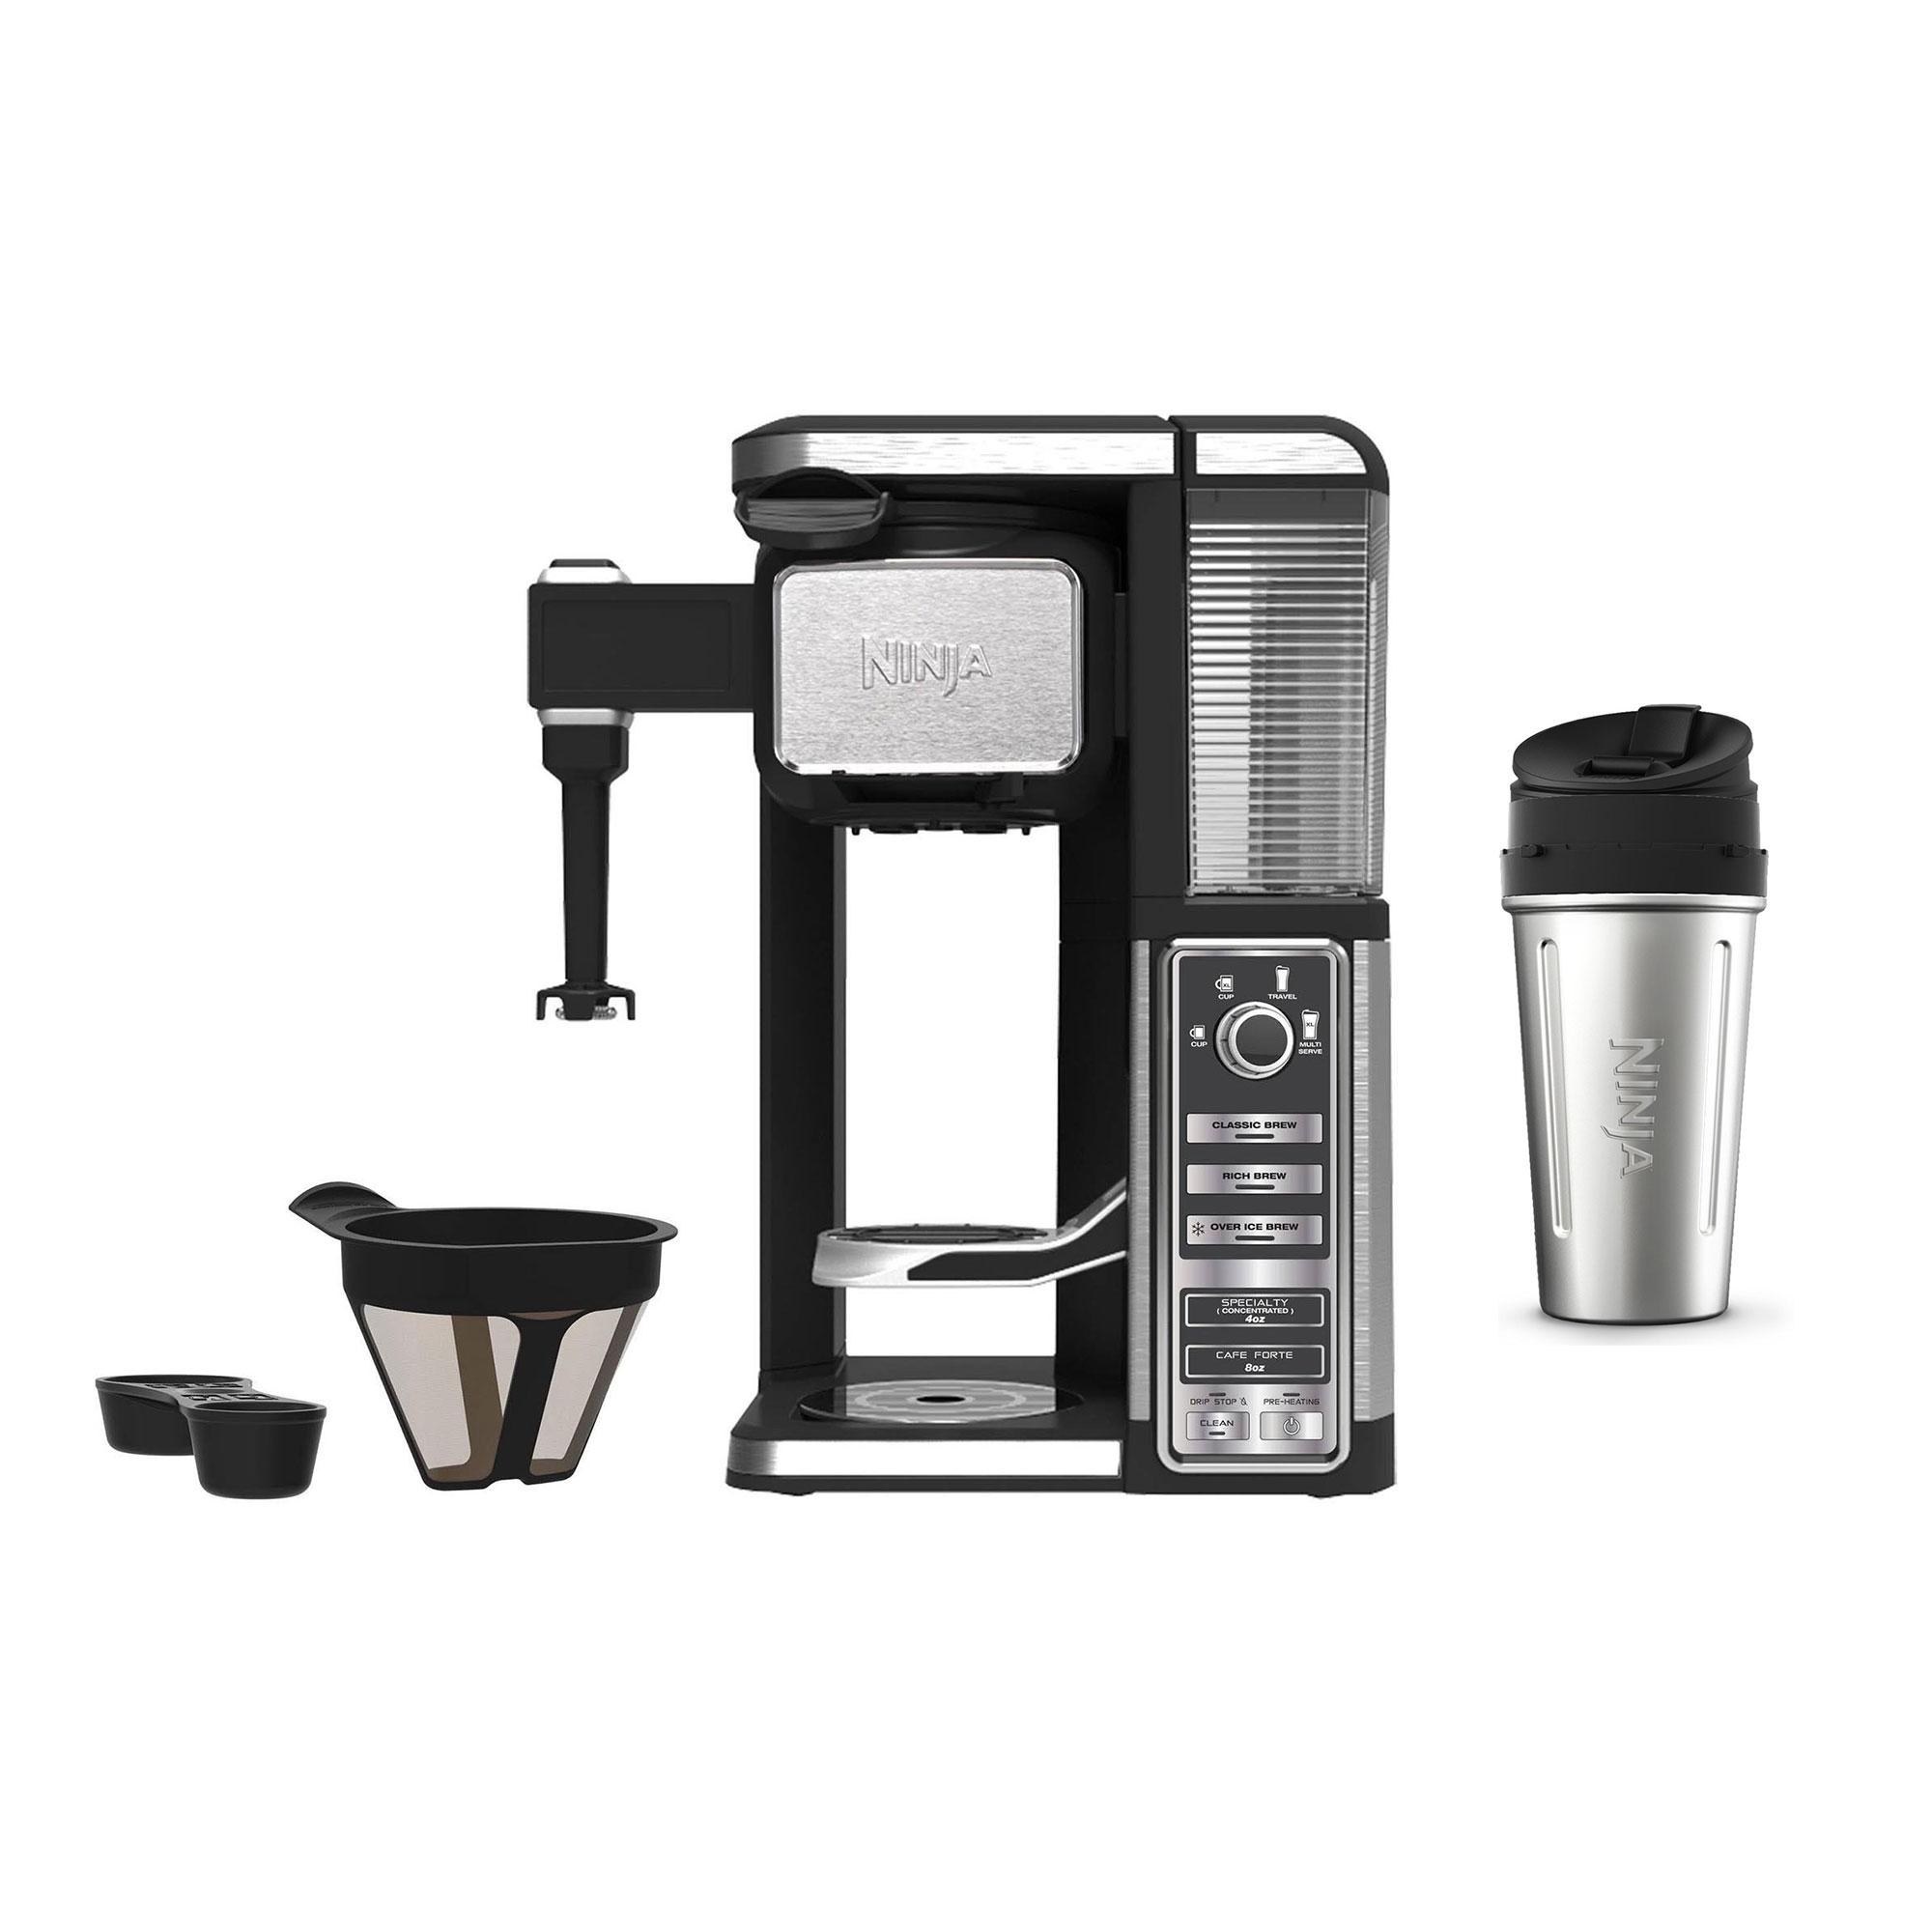 Ninja Auto Iq Single Serve Pod Free Coffee Machine Maker W Frother